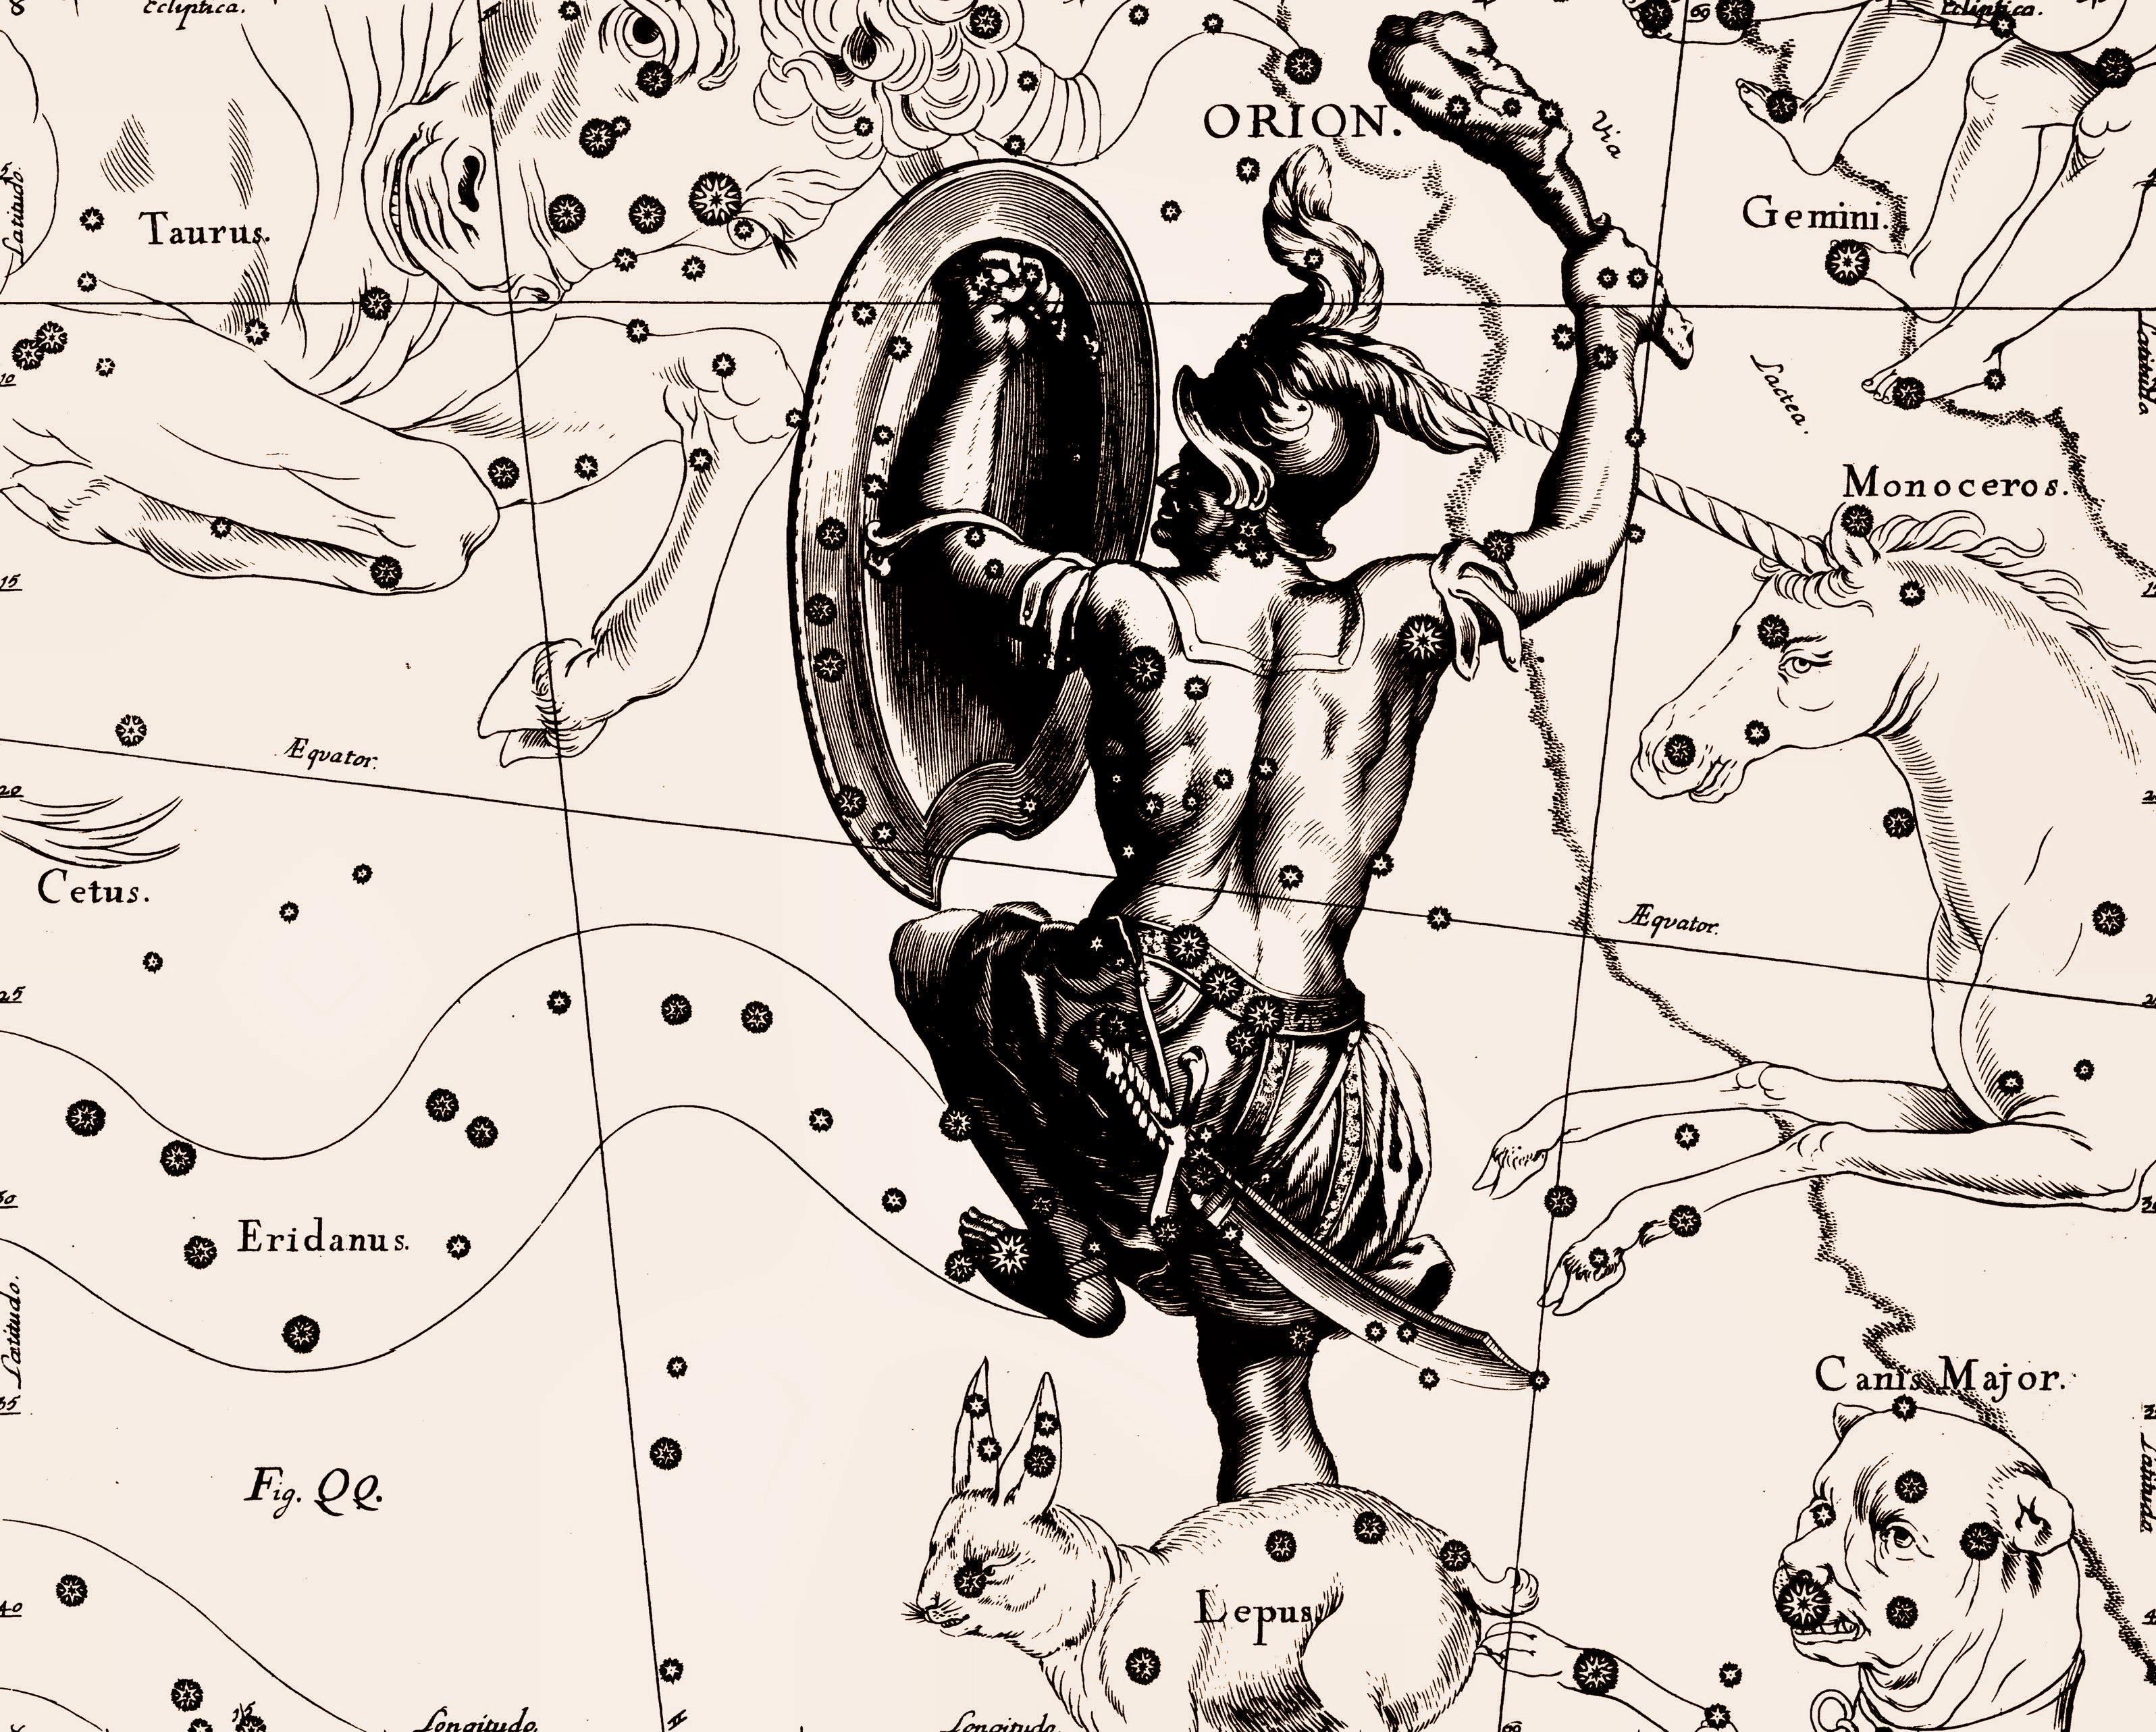 Карта звездного неба - Созвездие Ориона